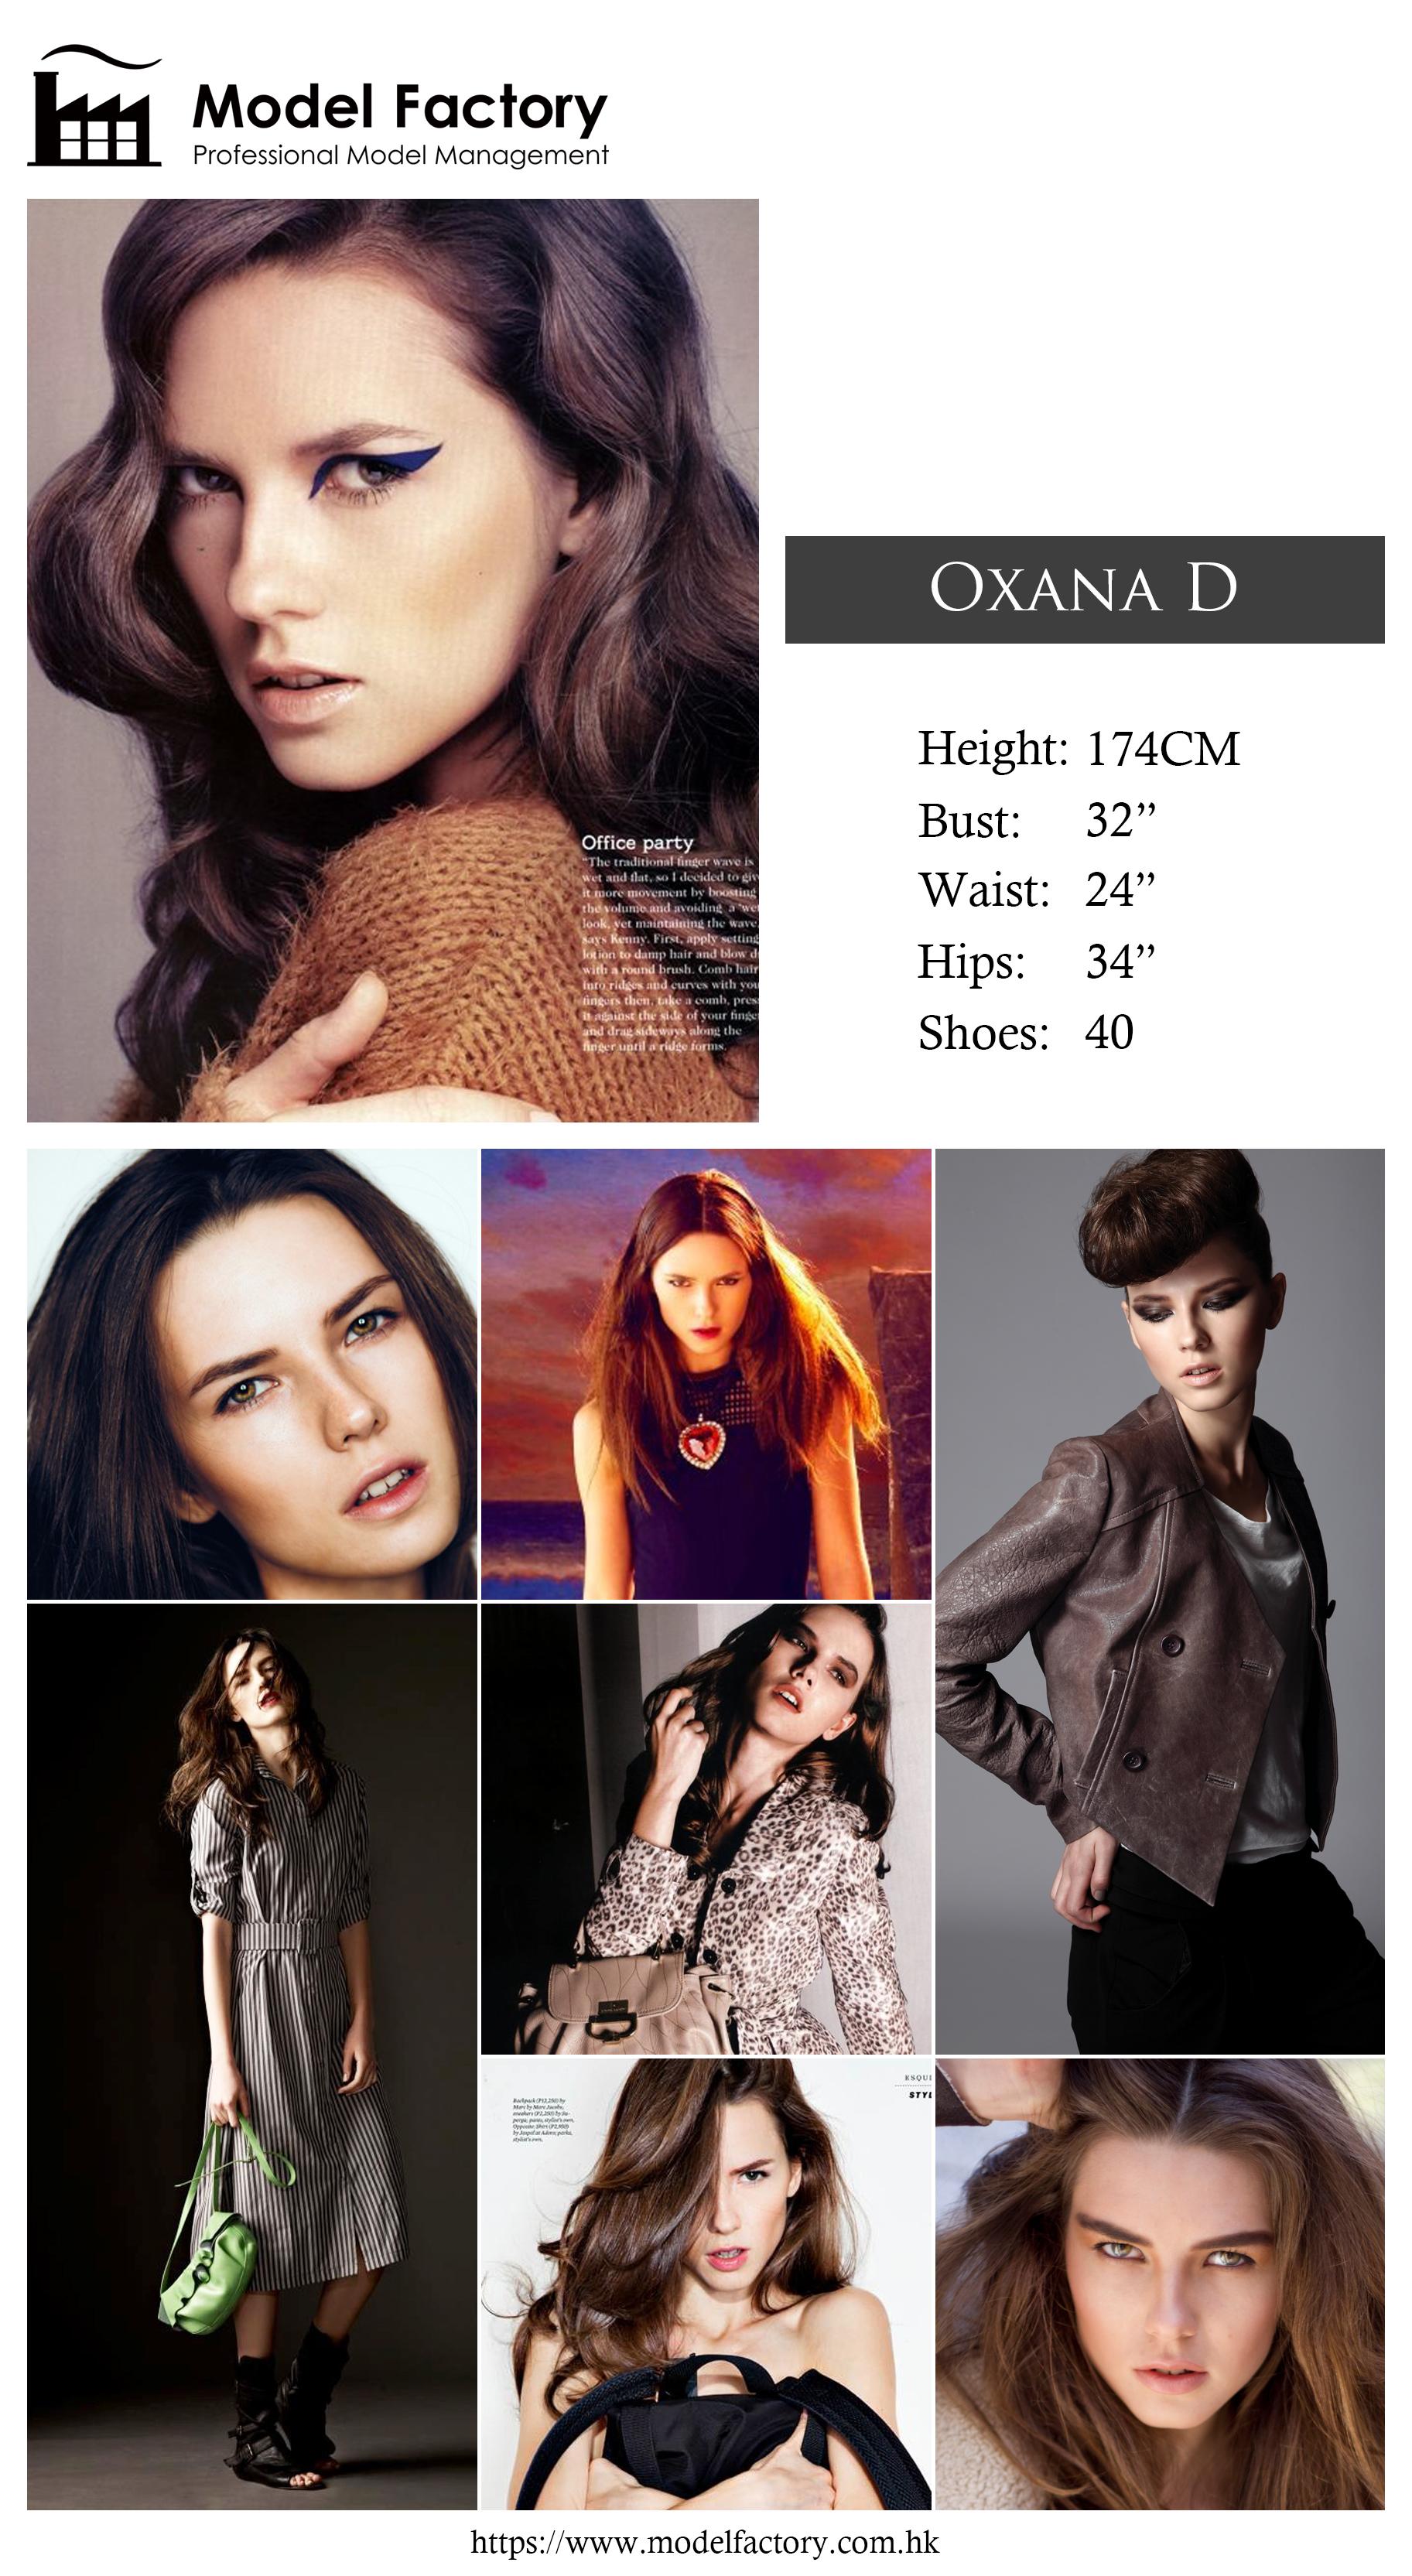 Model Factory Caucasian Female Model OxanaD